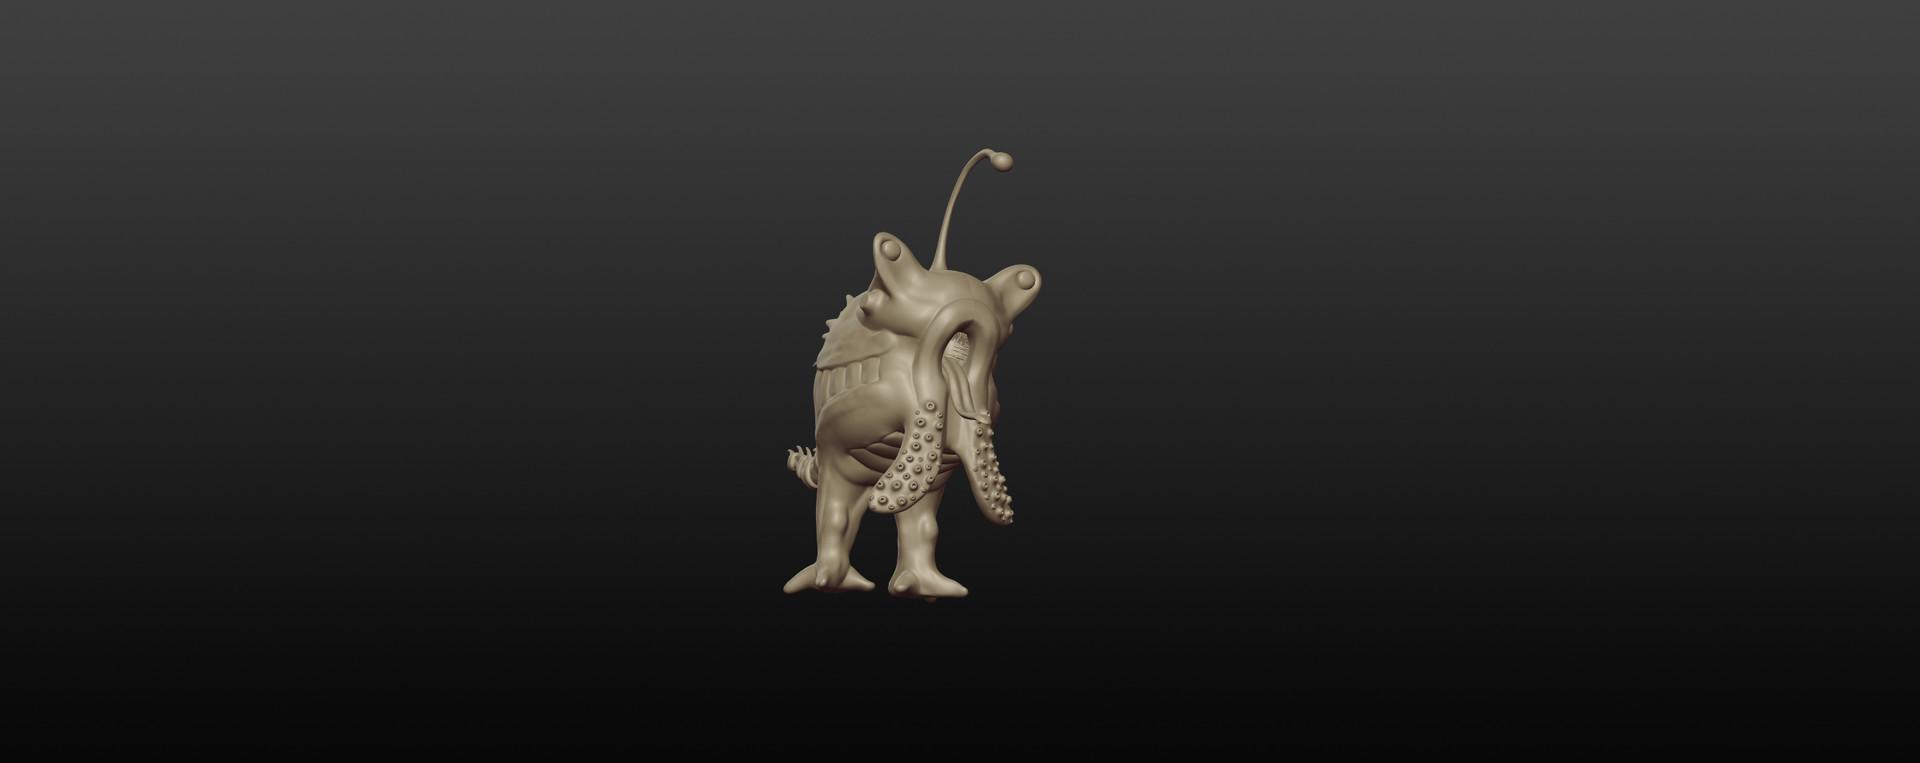 Matej chalachan creature2